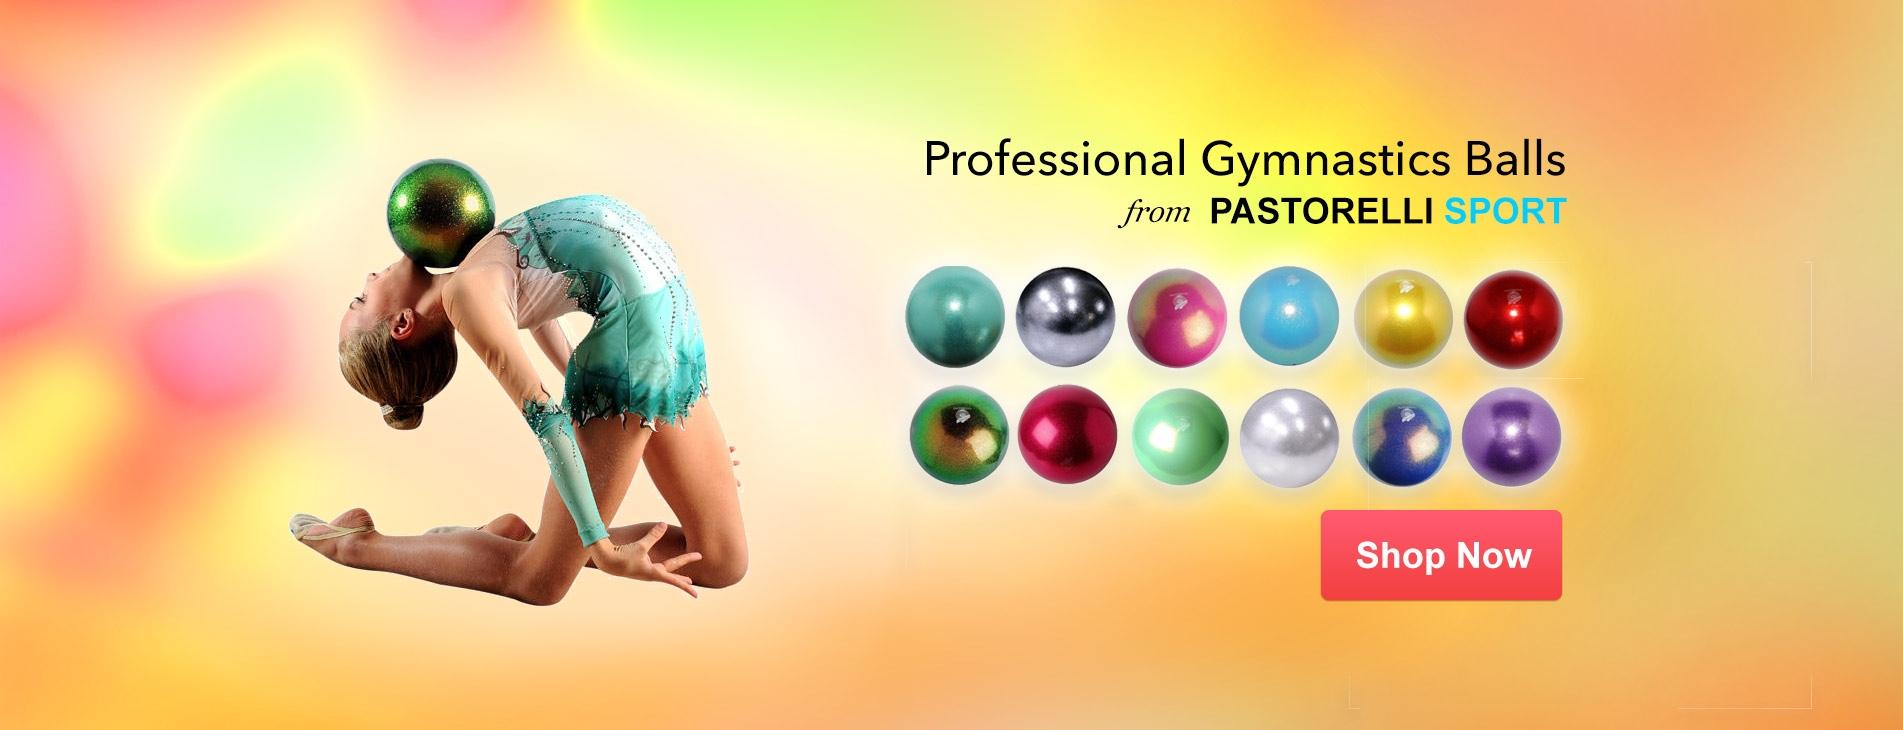 Show Gymnastics Balls